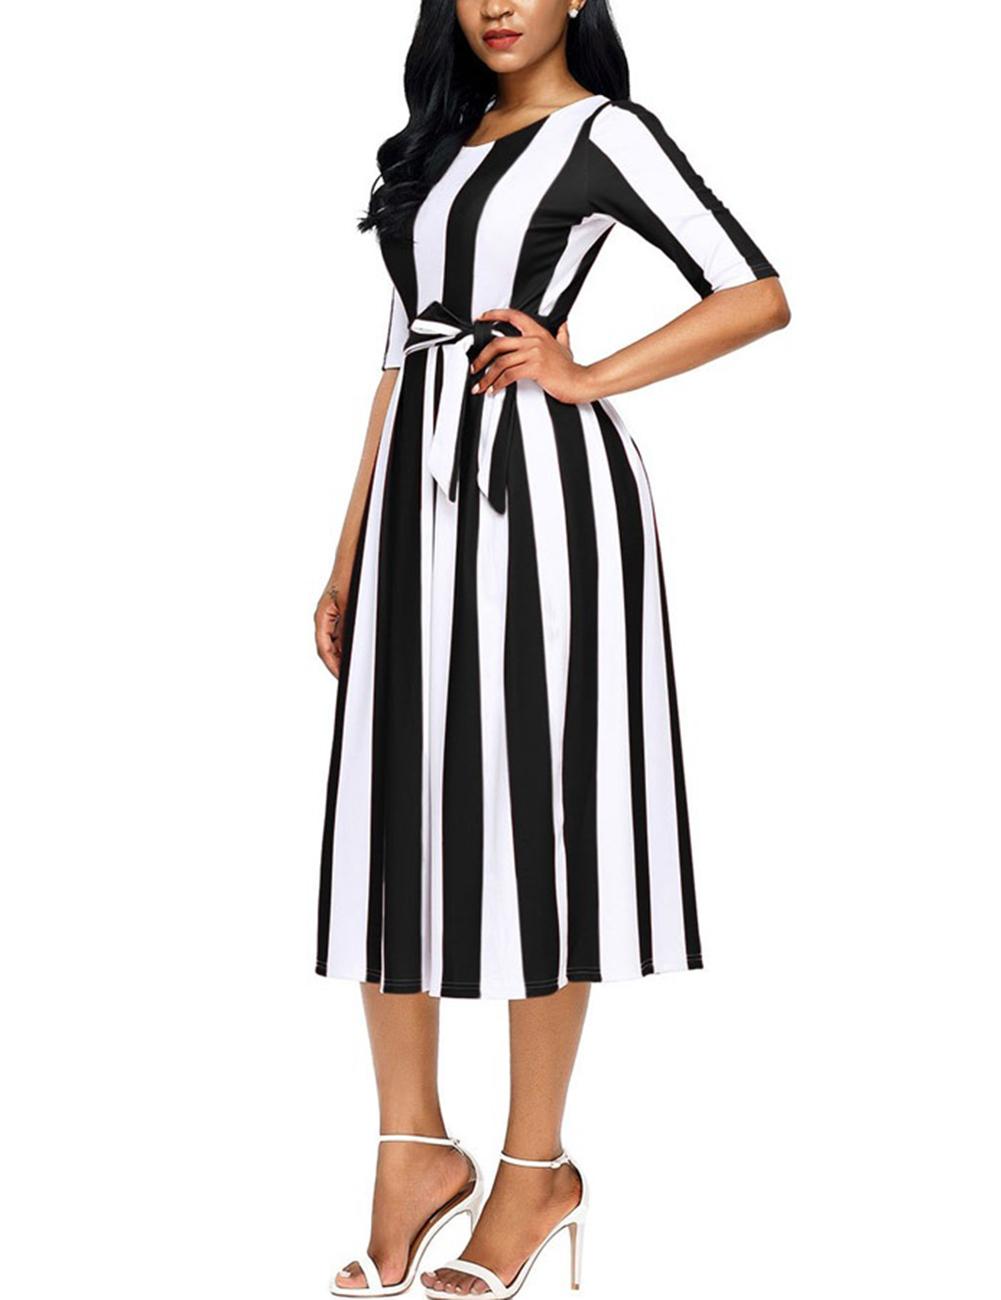 Lady A-line Long Dress Vertical Wide Stripes Half Sleeve Round Neck Waist Belt Valentines Gift